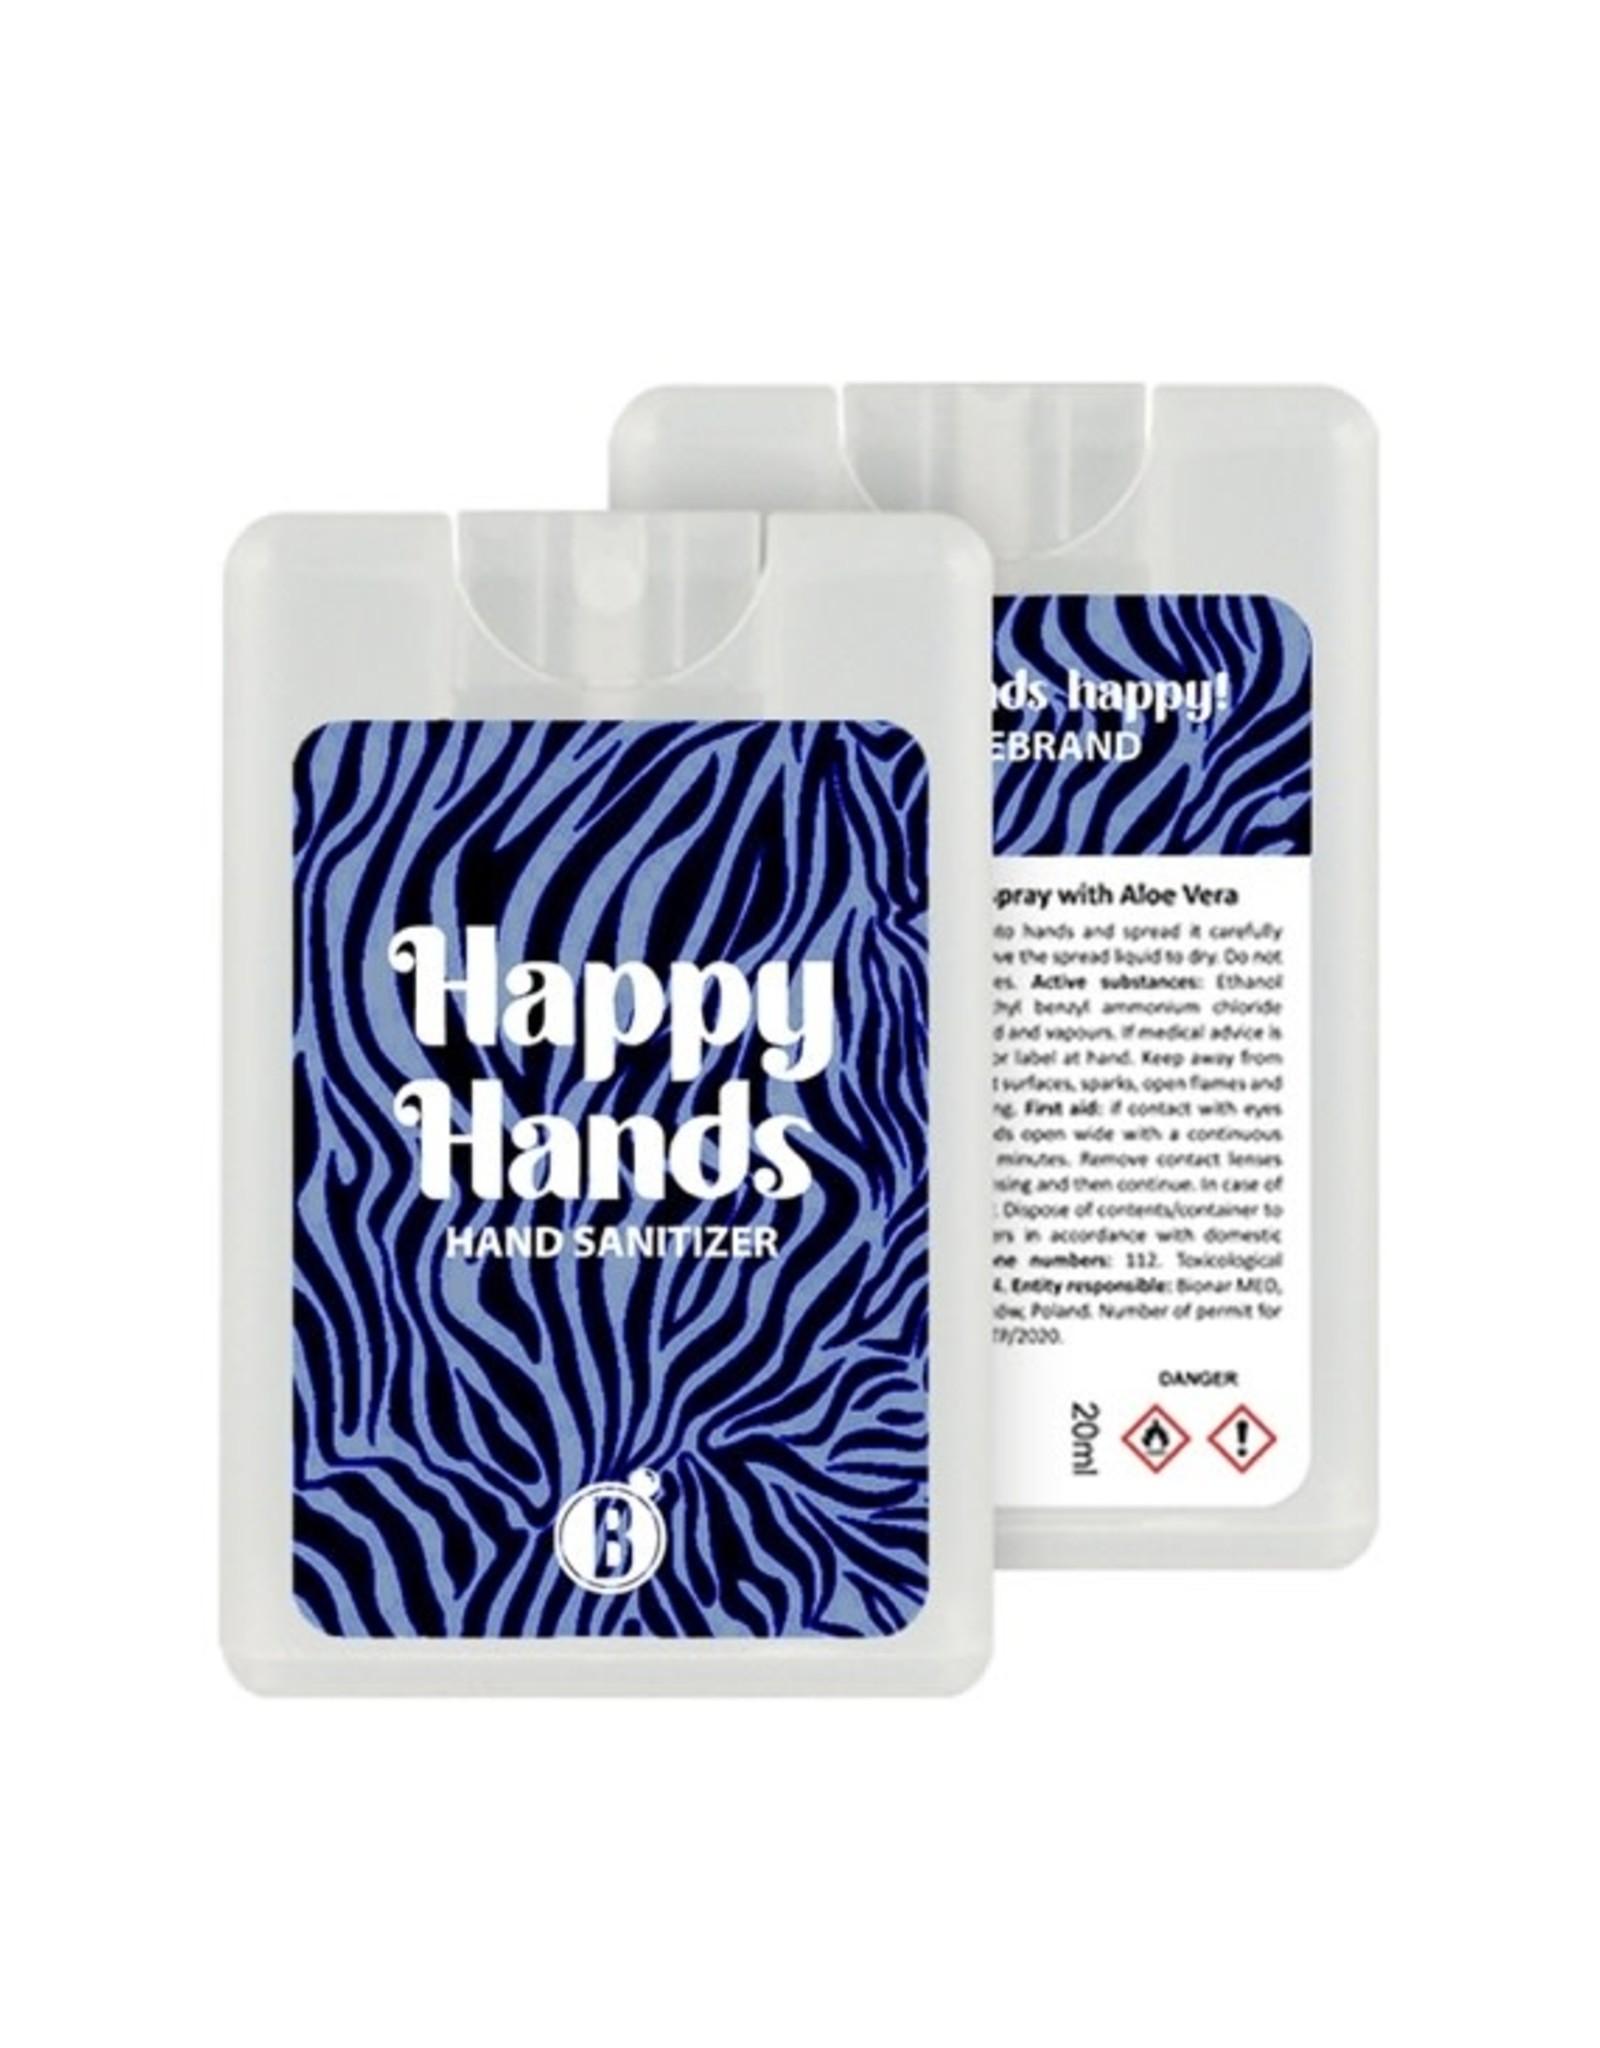 Bubbles The Brand Happy hands desinfectie spray Zebra Blues